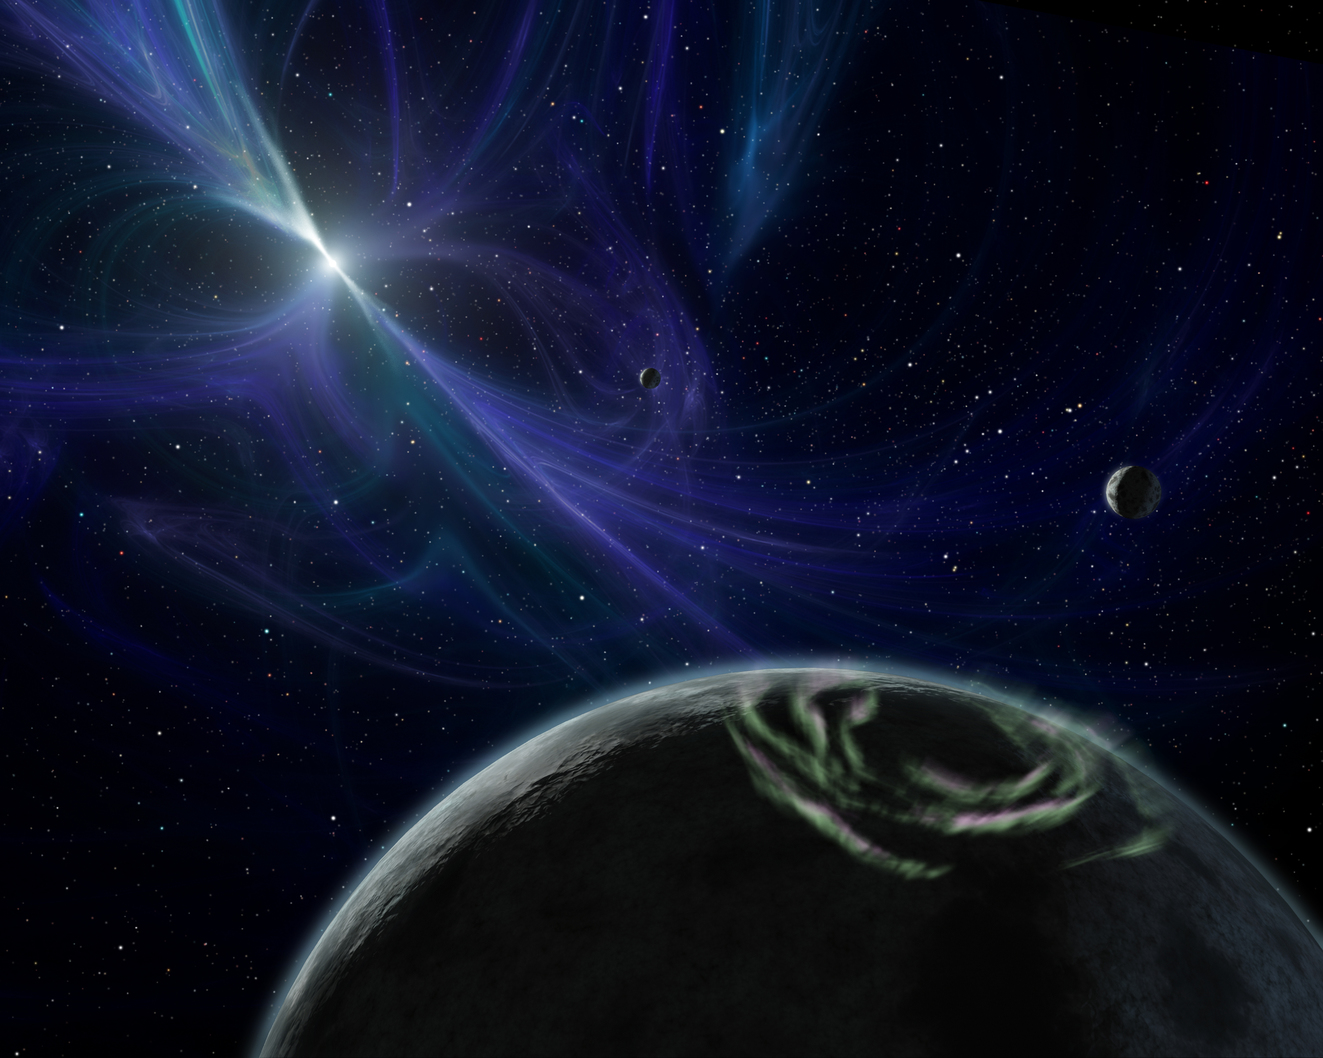 Artist's impression of the planets orbiting the pulsar PSR B1257 +12. - Image Credit:NASA/JPL-Caltech/R. Hurt (SSC)